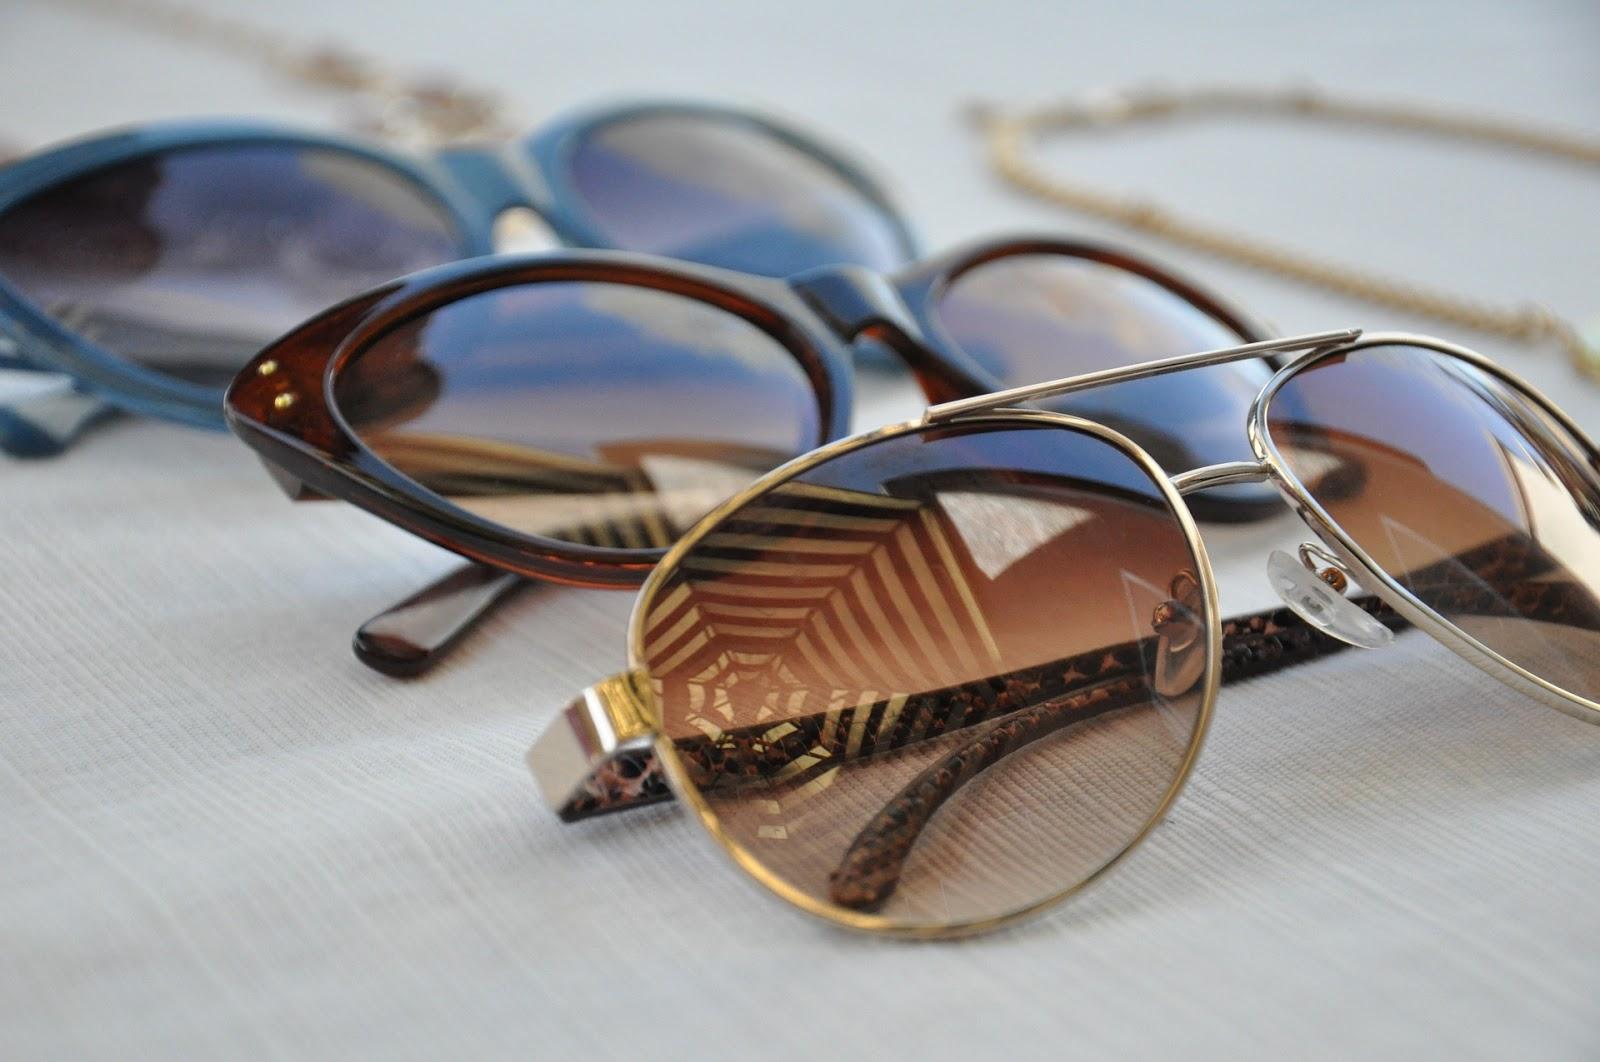 c5aa9642ea4 Top 5 Cheap Sunglasses in 2019 - Men's Fashion